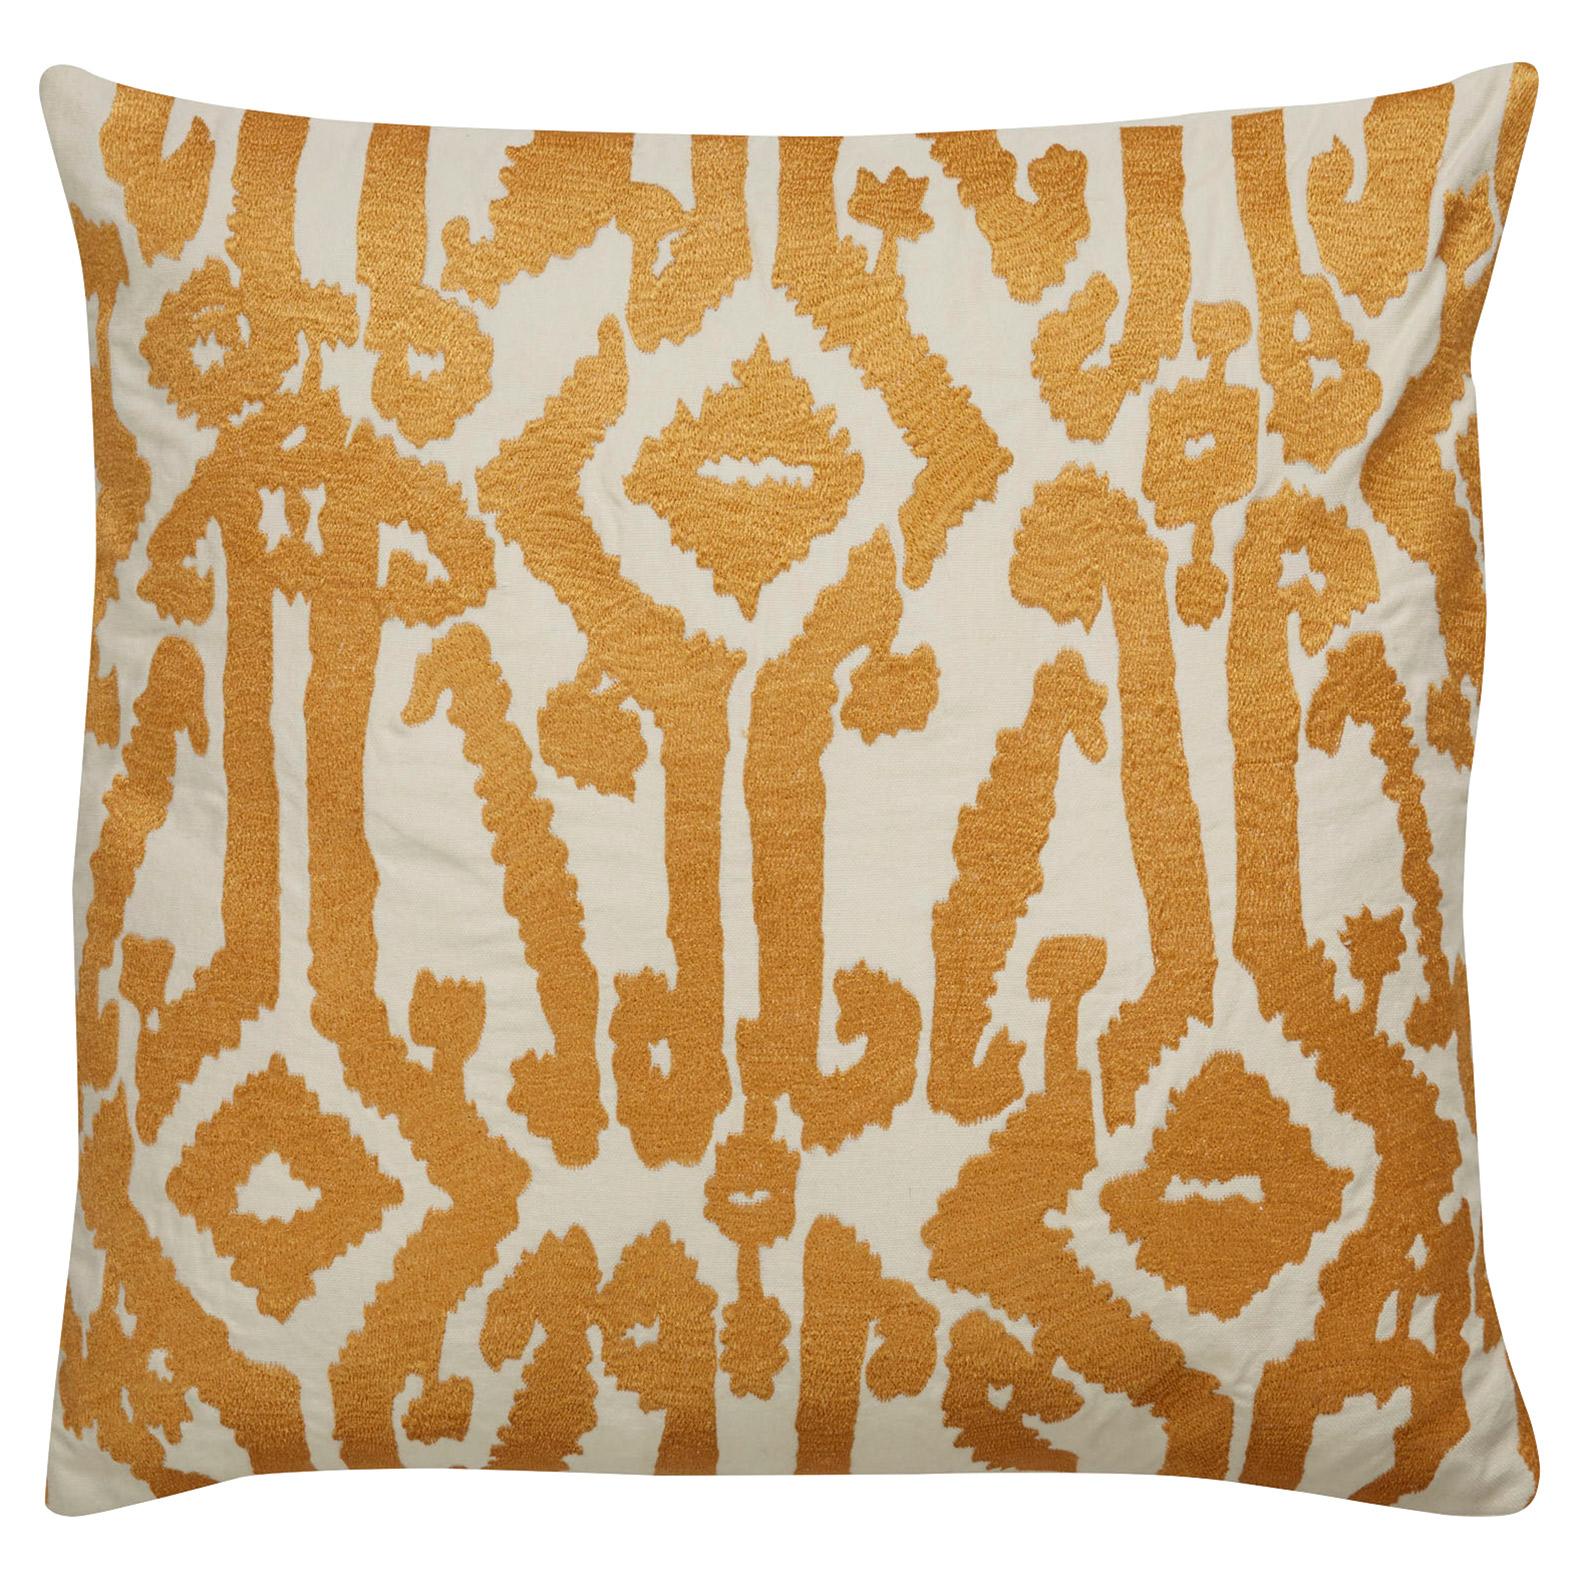 Azalea Global Artisan Embroidered Gold Pillow - 18x18